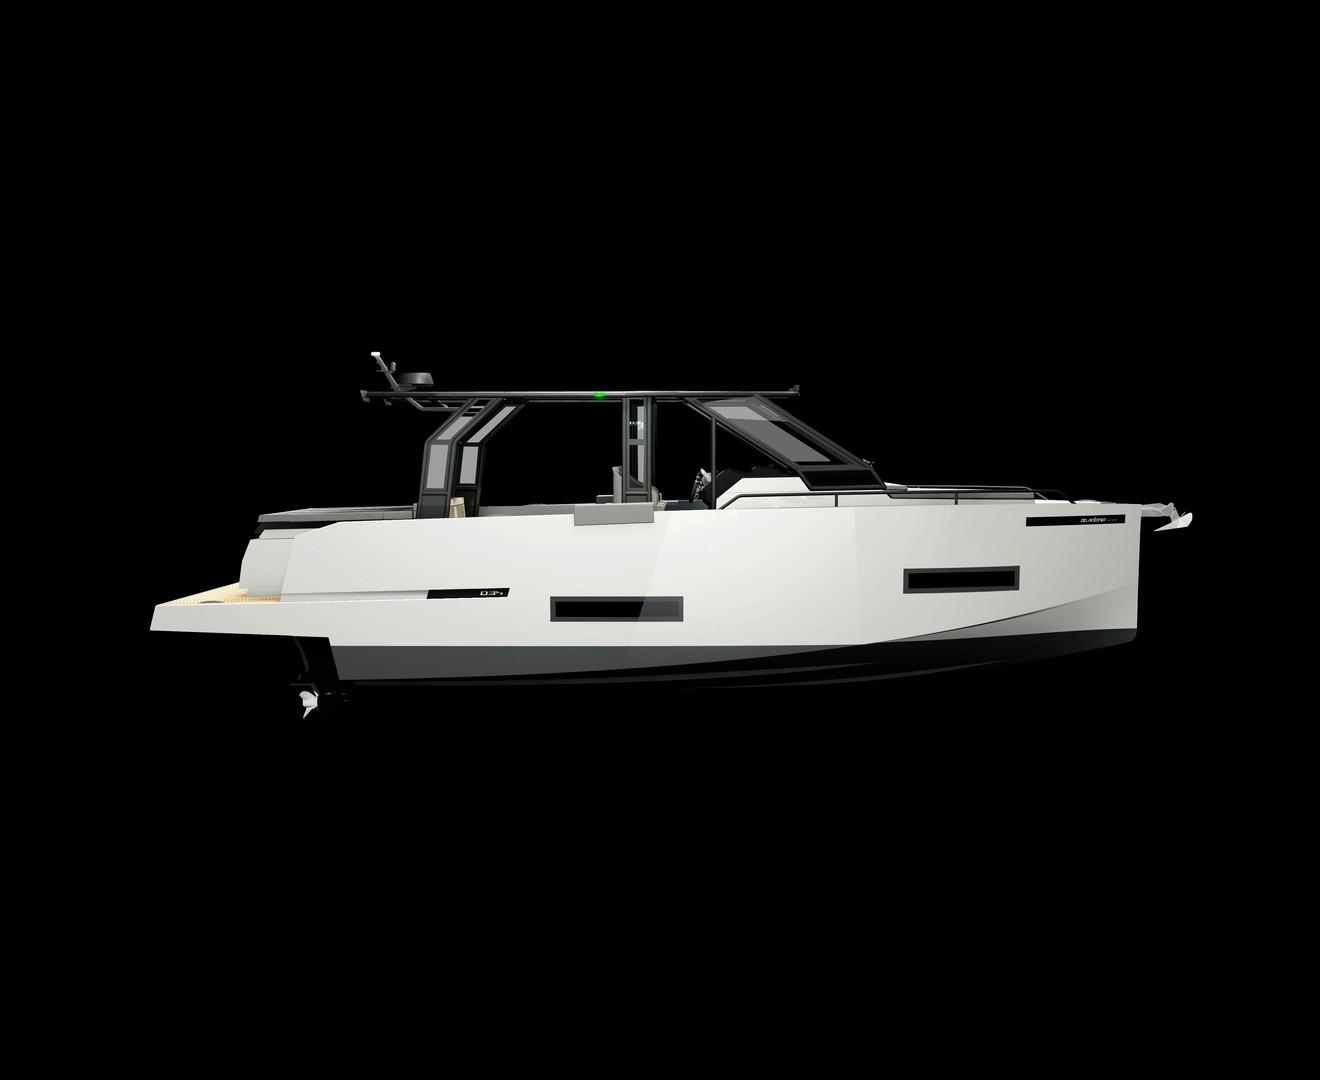 De Antonio Yachts_D34 Xplorer-C_07.jpg